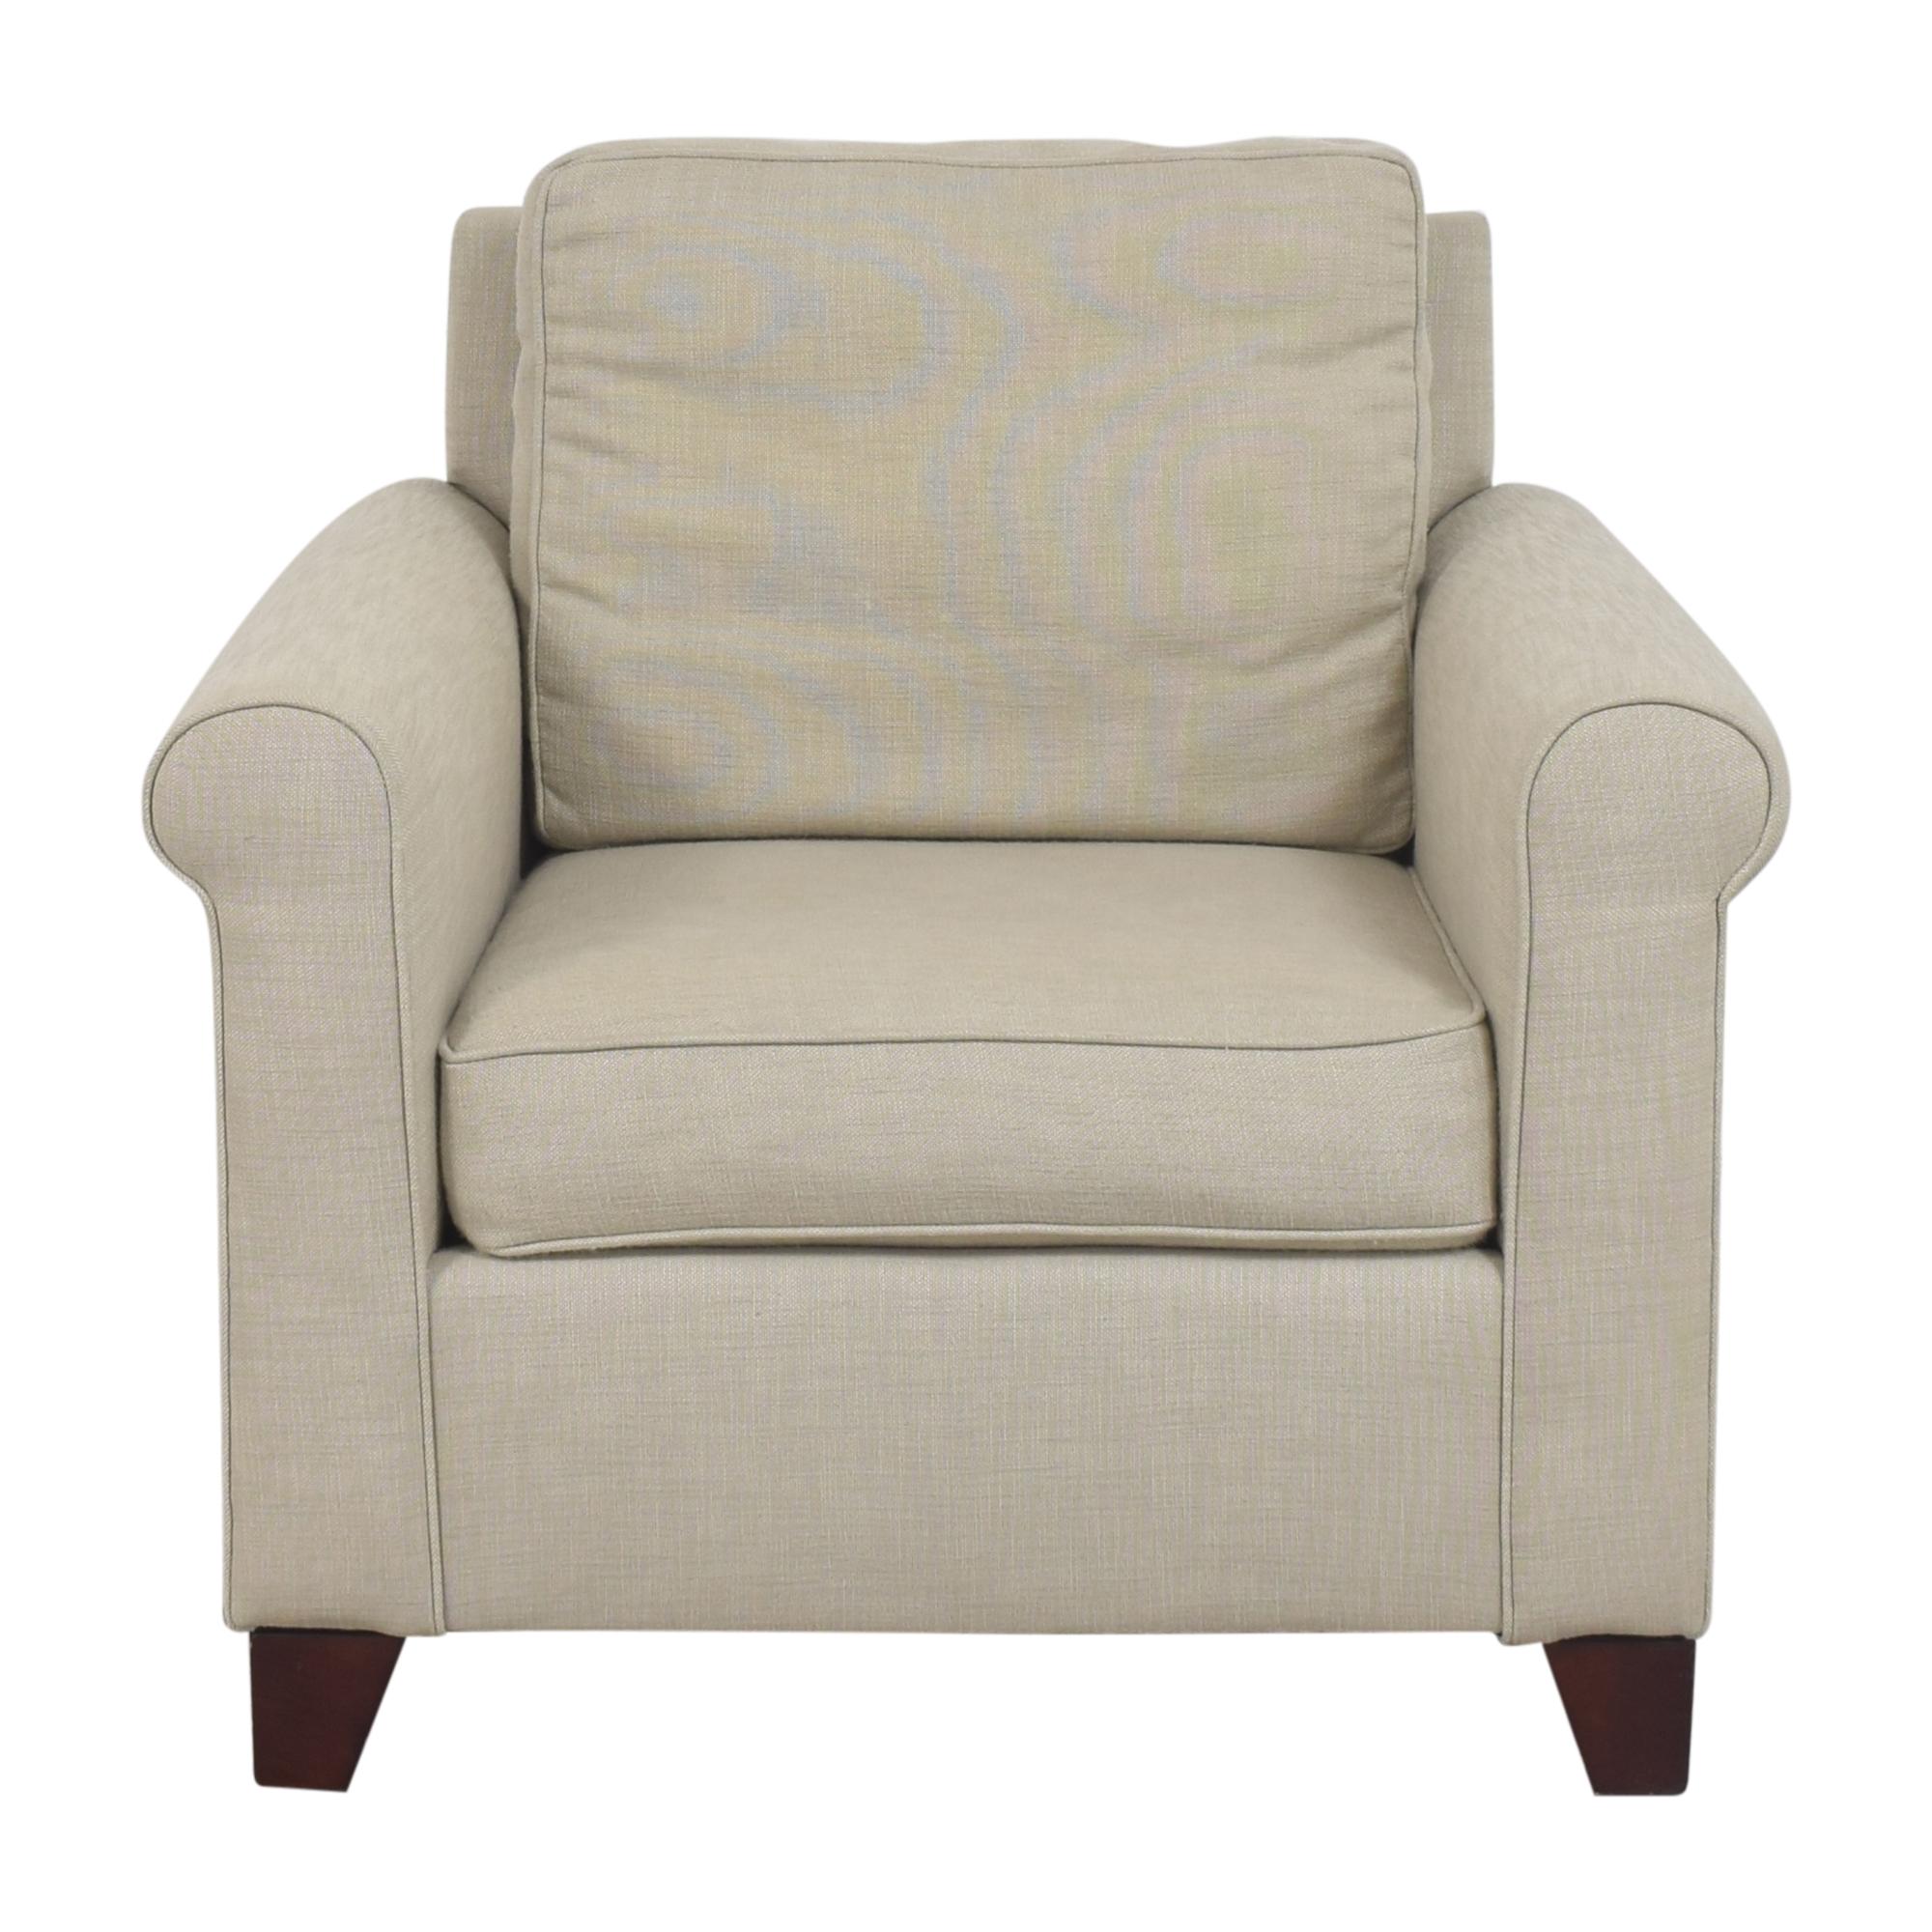 buy Pottery Barn Pottery Barn Cameron Roll Arm Deep Seat Armchair online